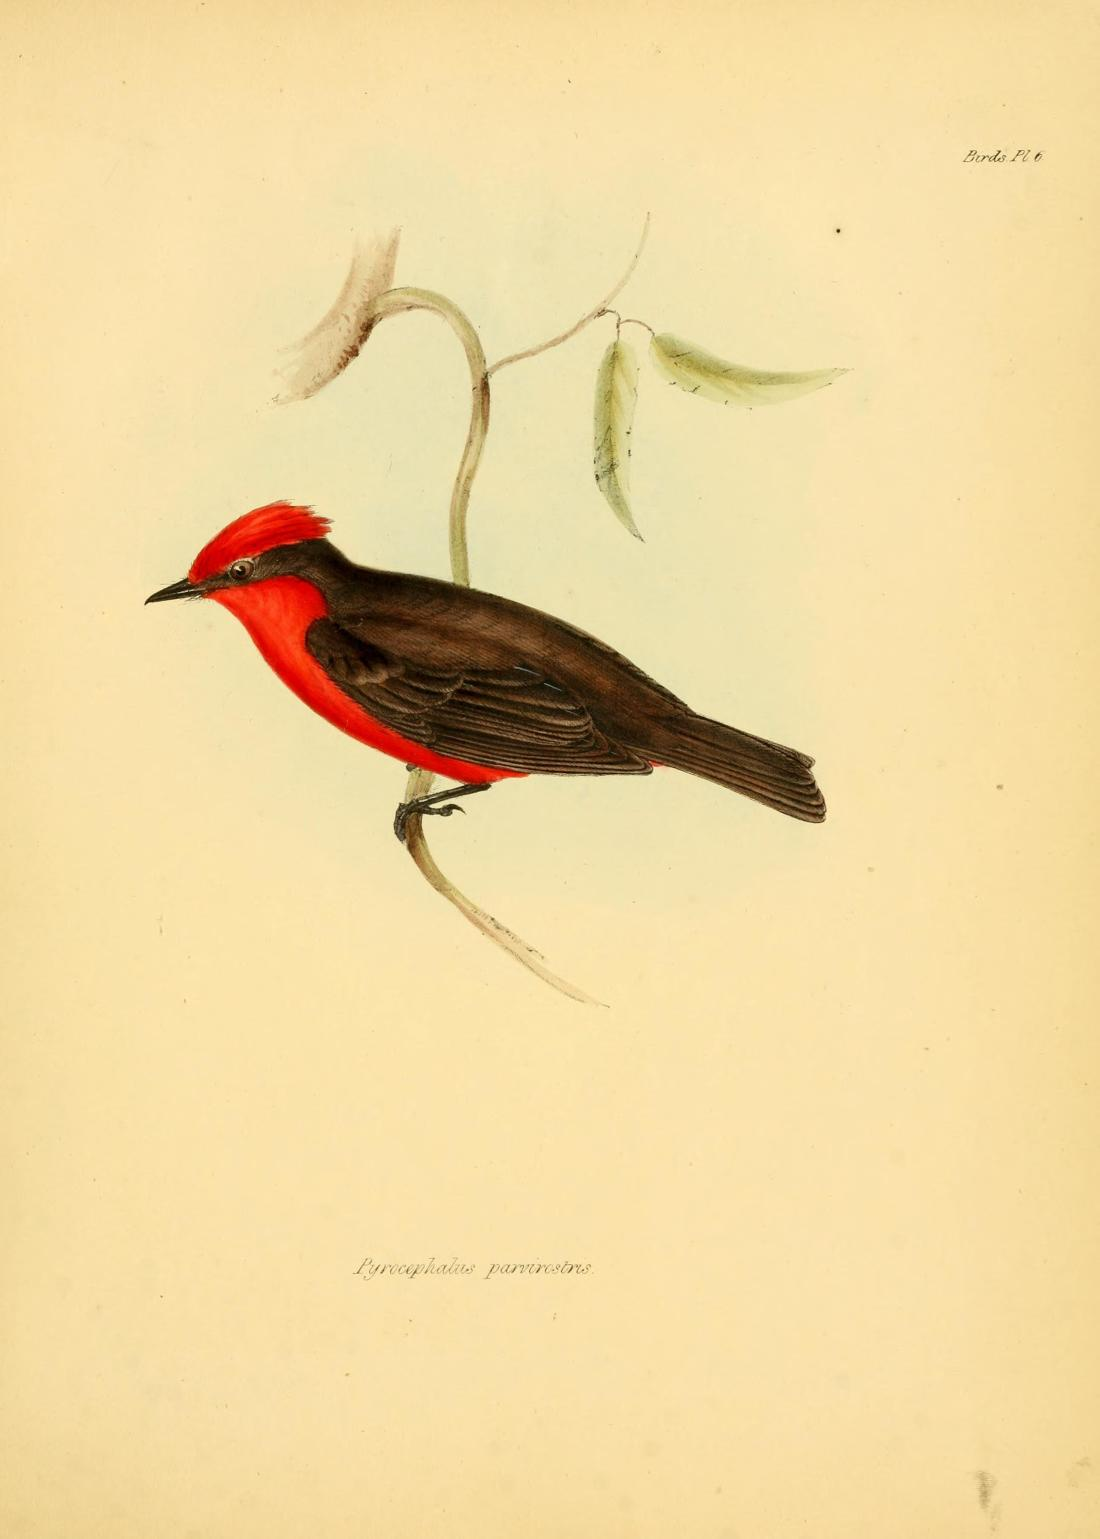 "'""Pyrocephalus Parvirostris"" (Flycatcher)."